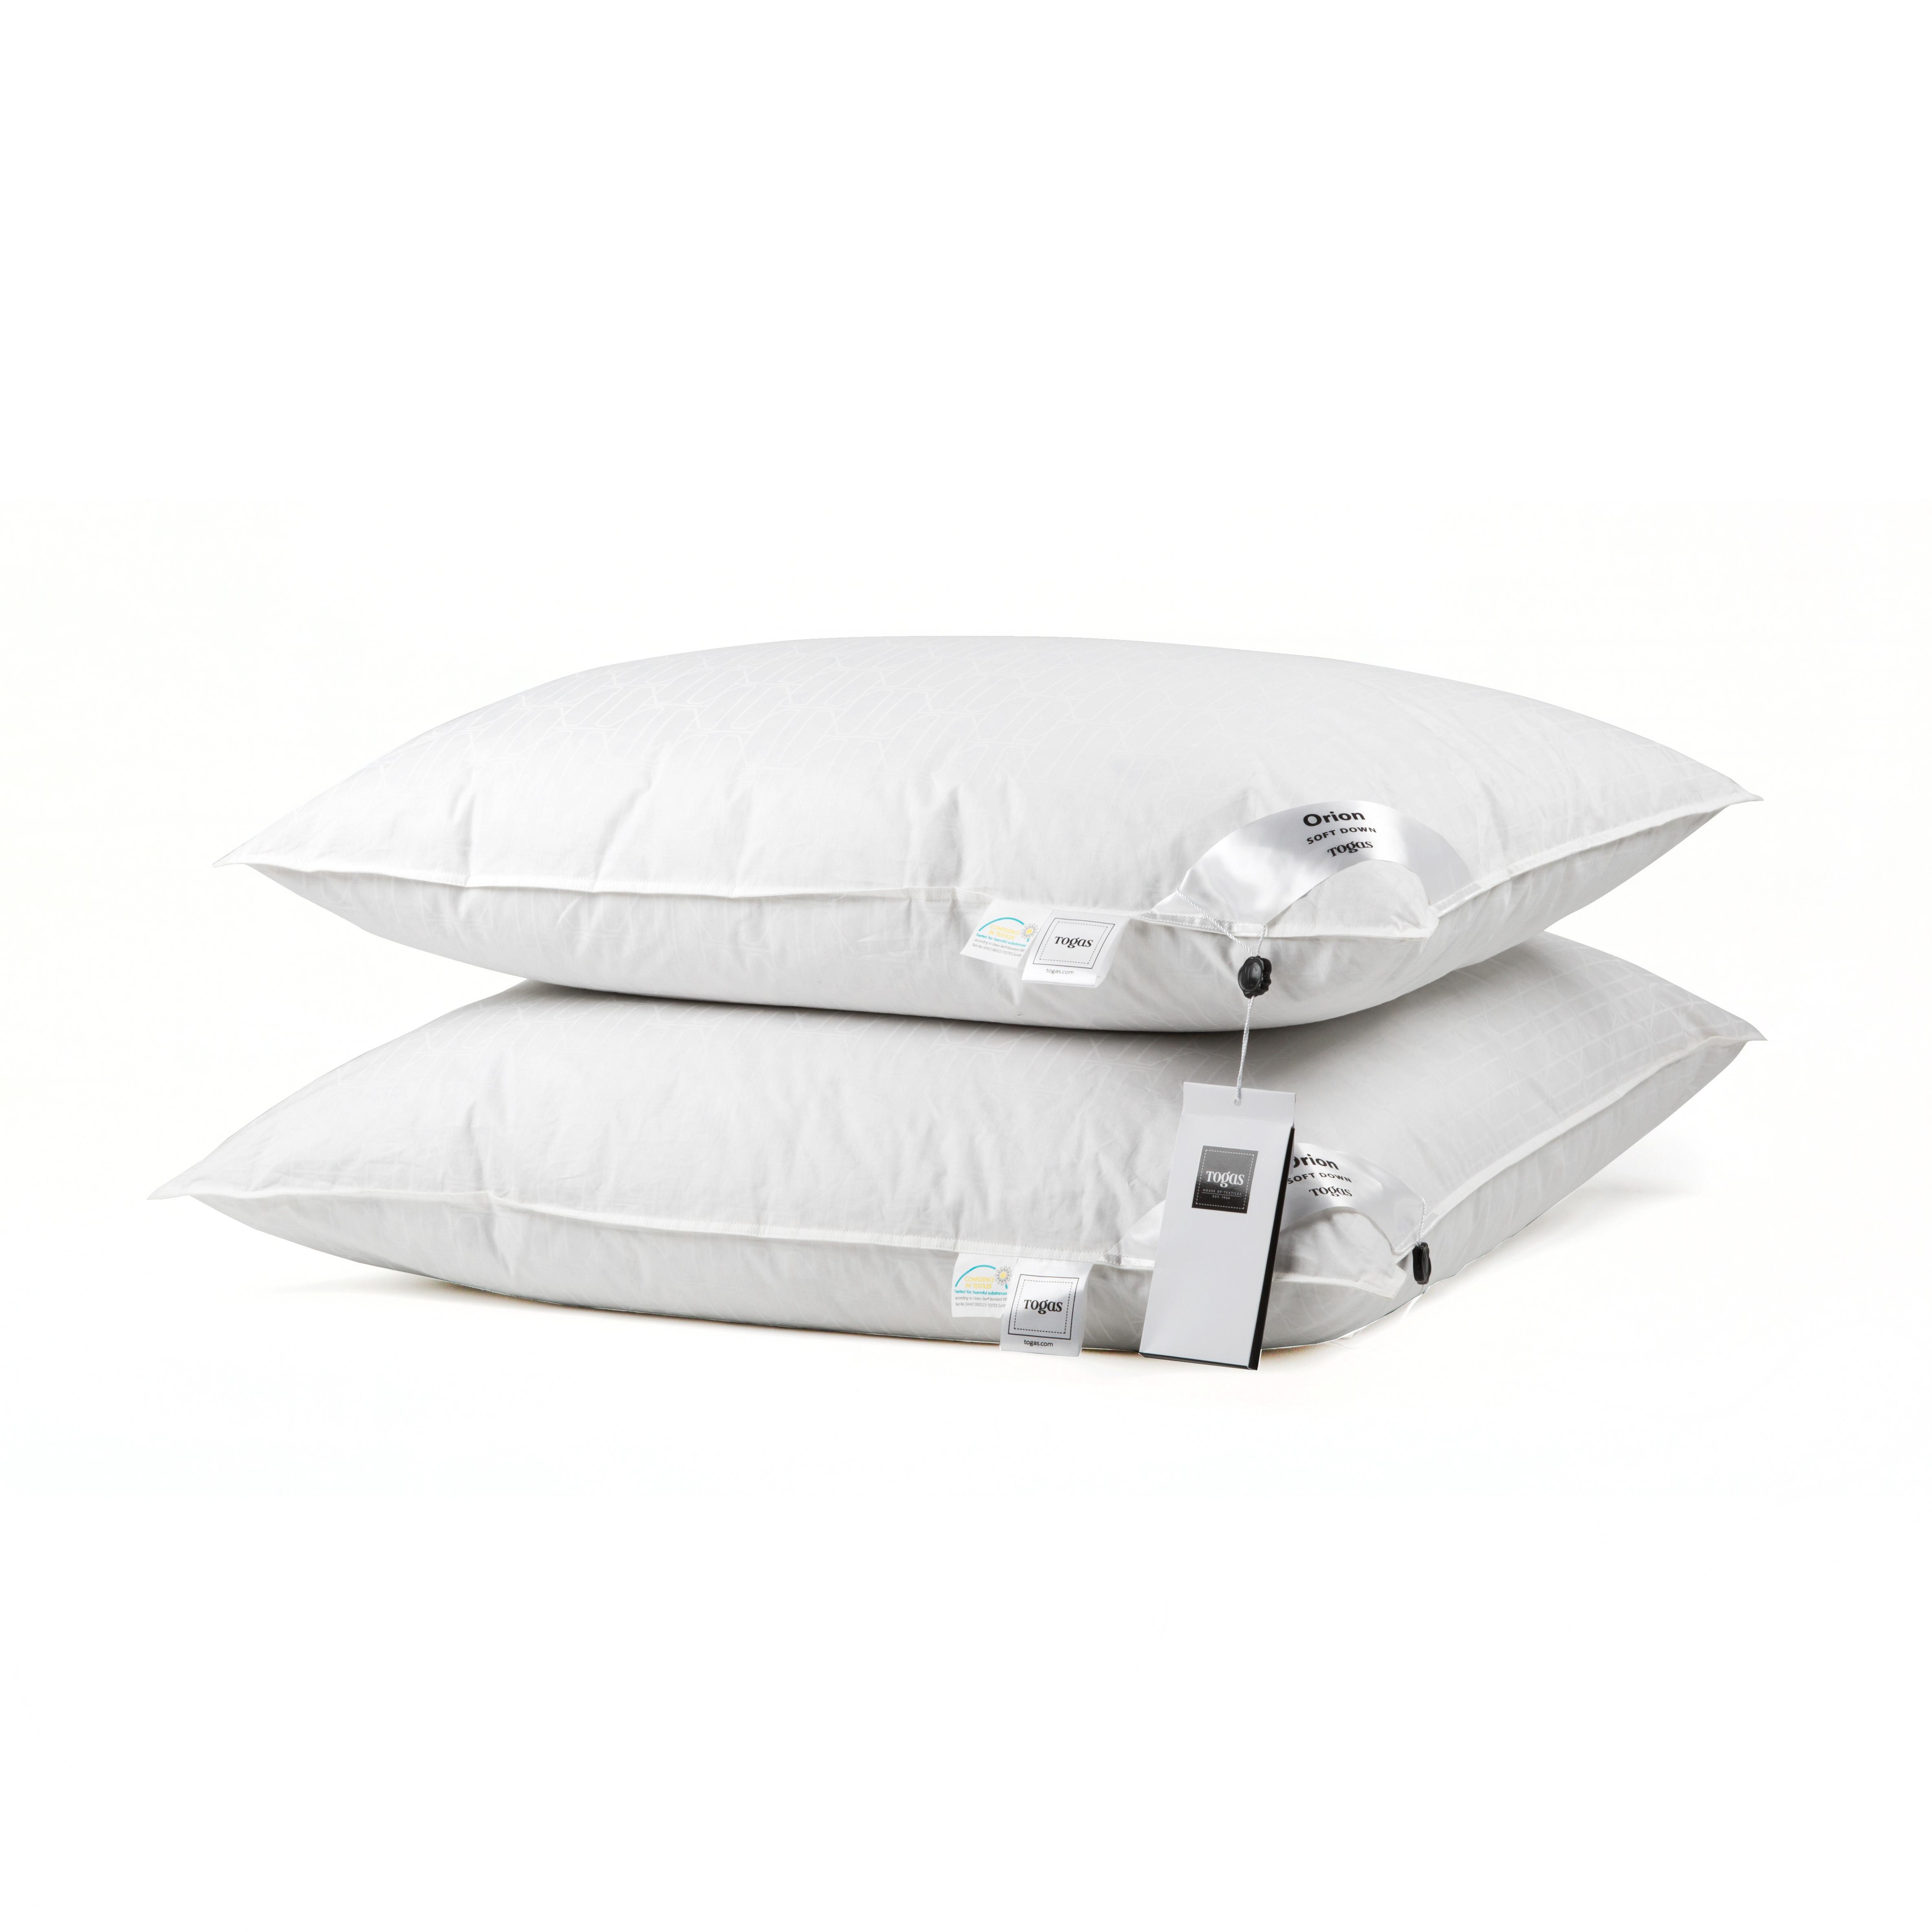 Подушки Togas Подушка Орион (50х70) подушки ортопедические togas подушка ортопедическая германиум